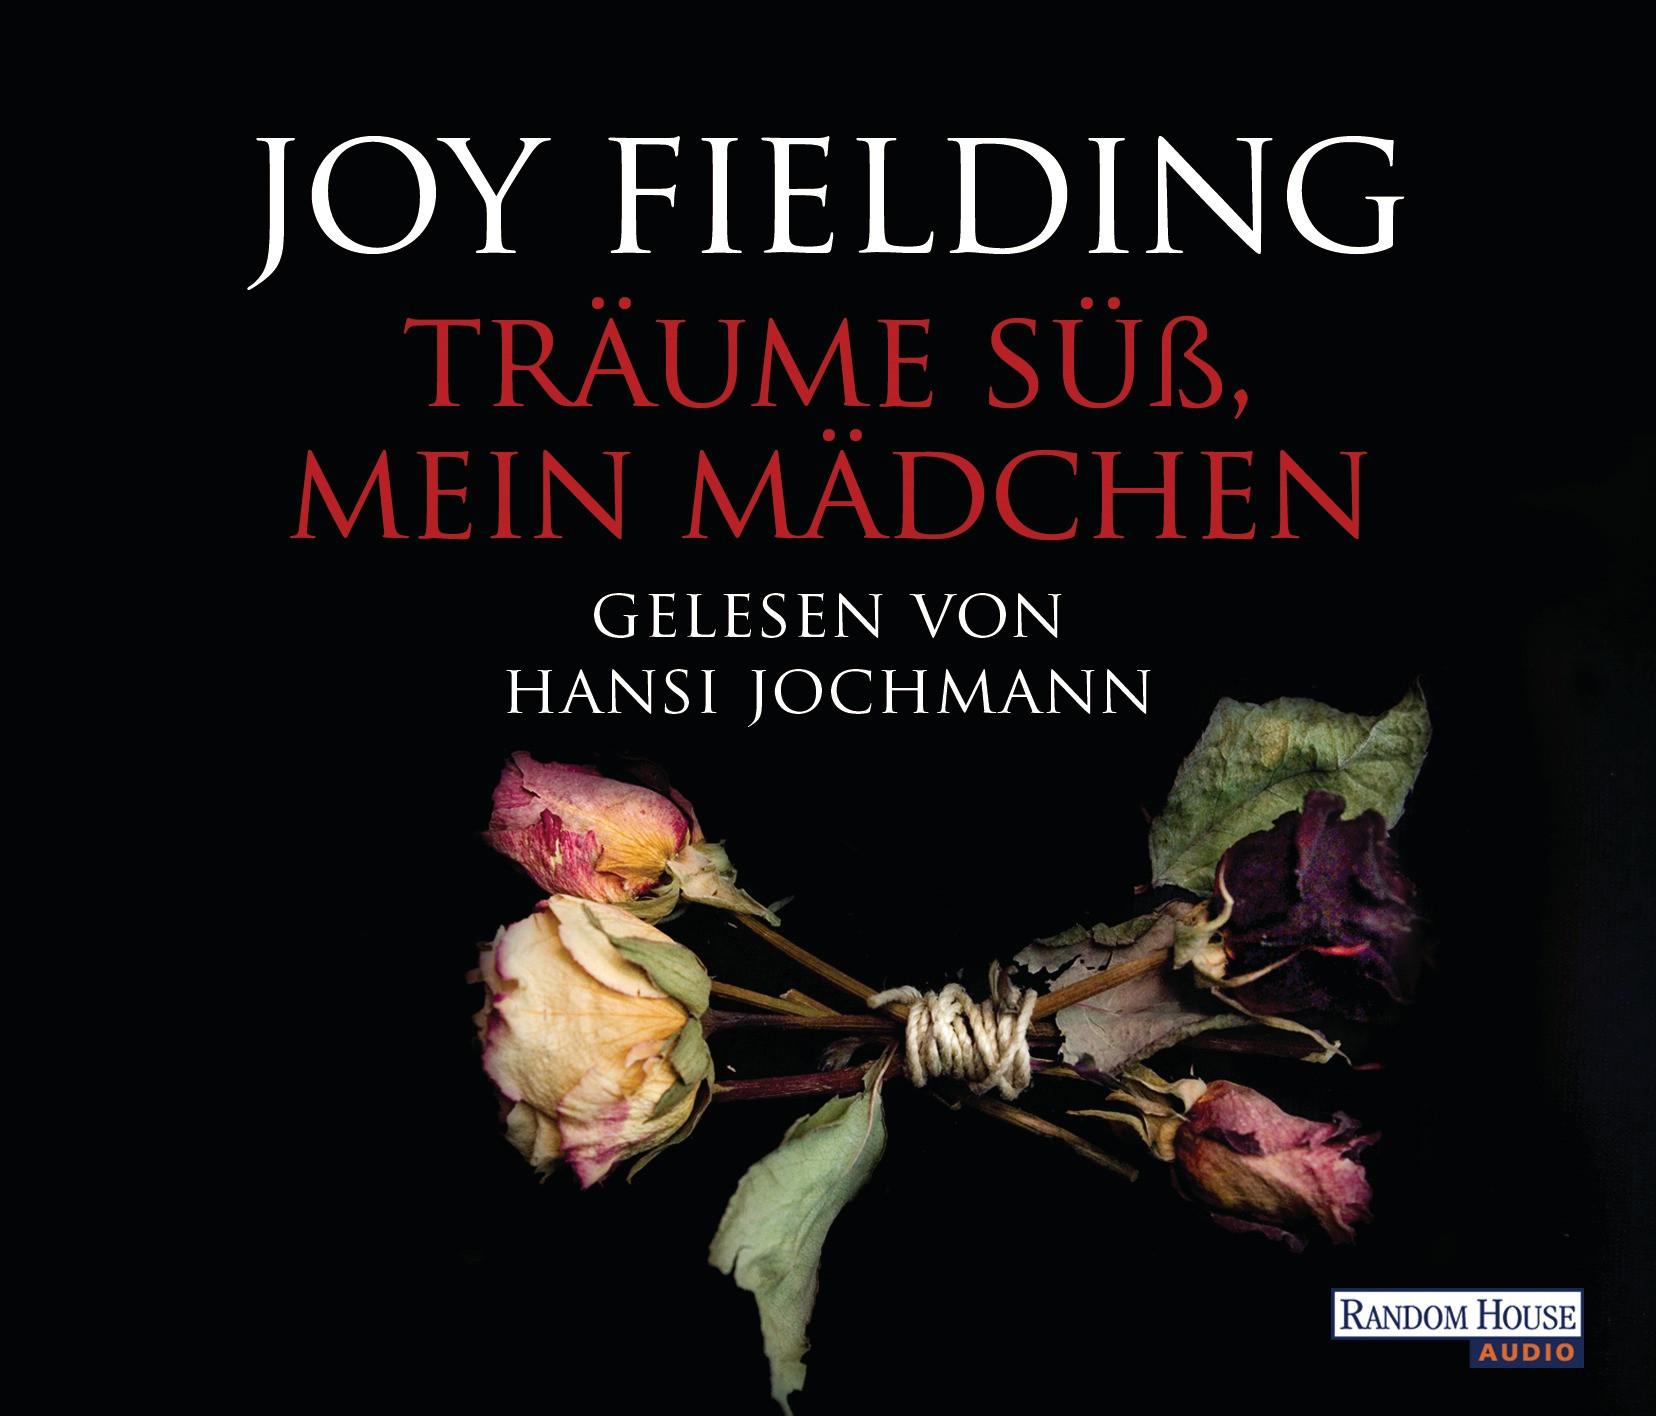 Joy Fielding - Träume süß, mein Mädchen